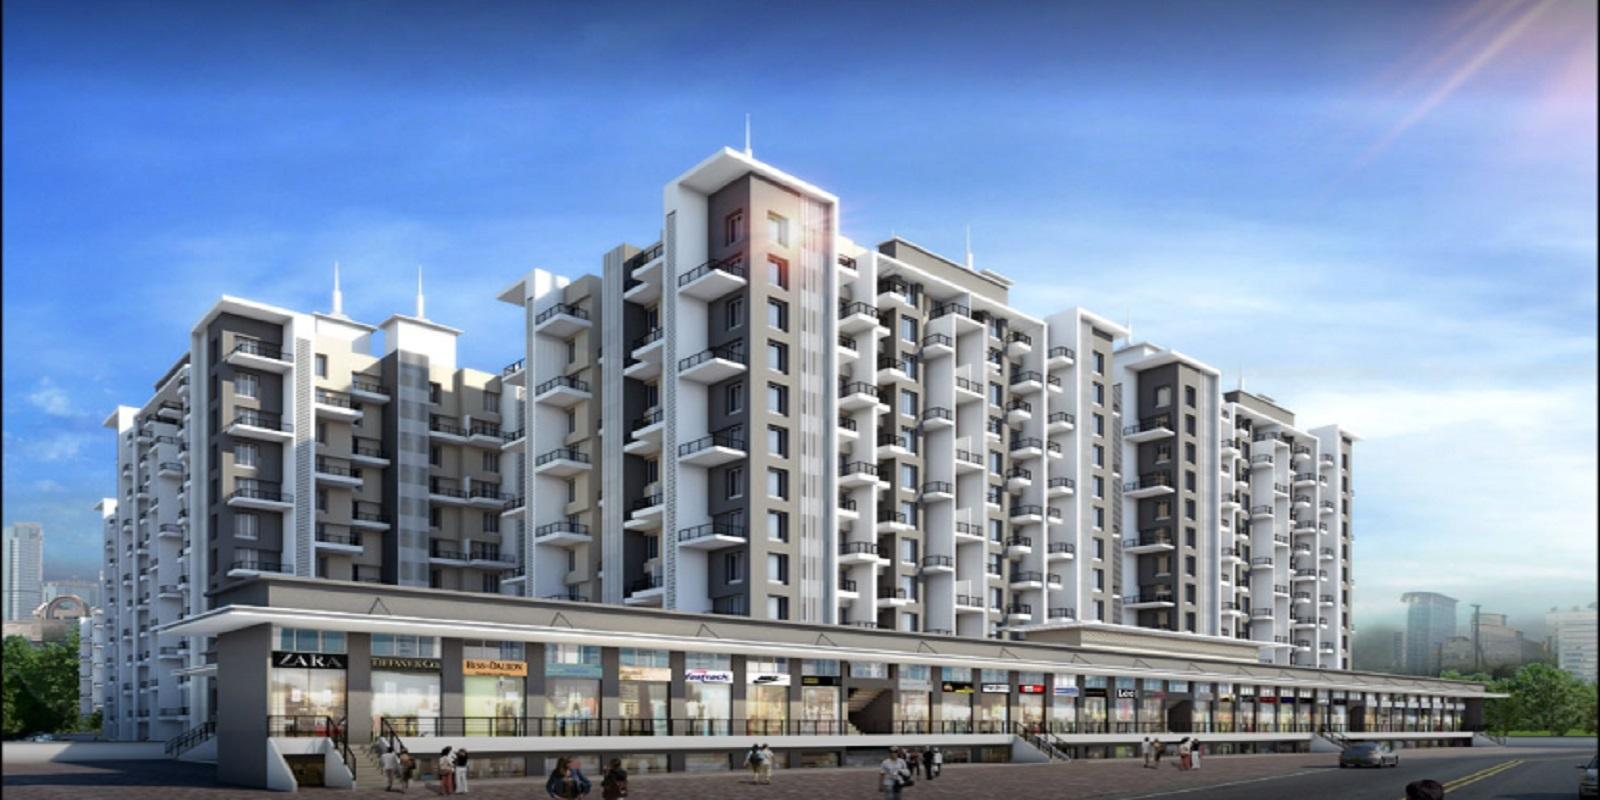 majestique manhattan g building project project large image1